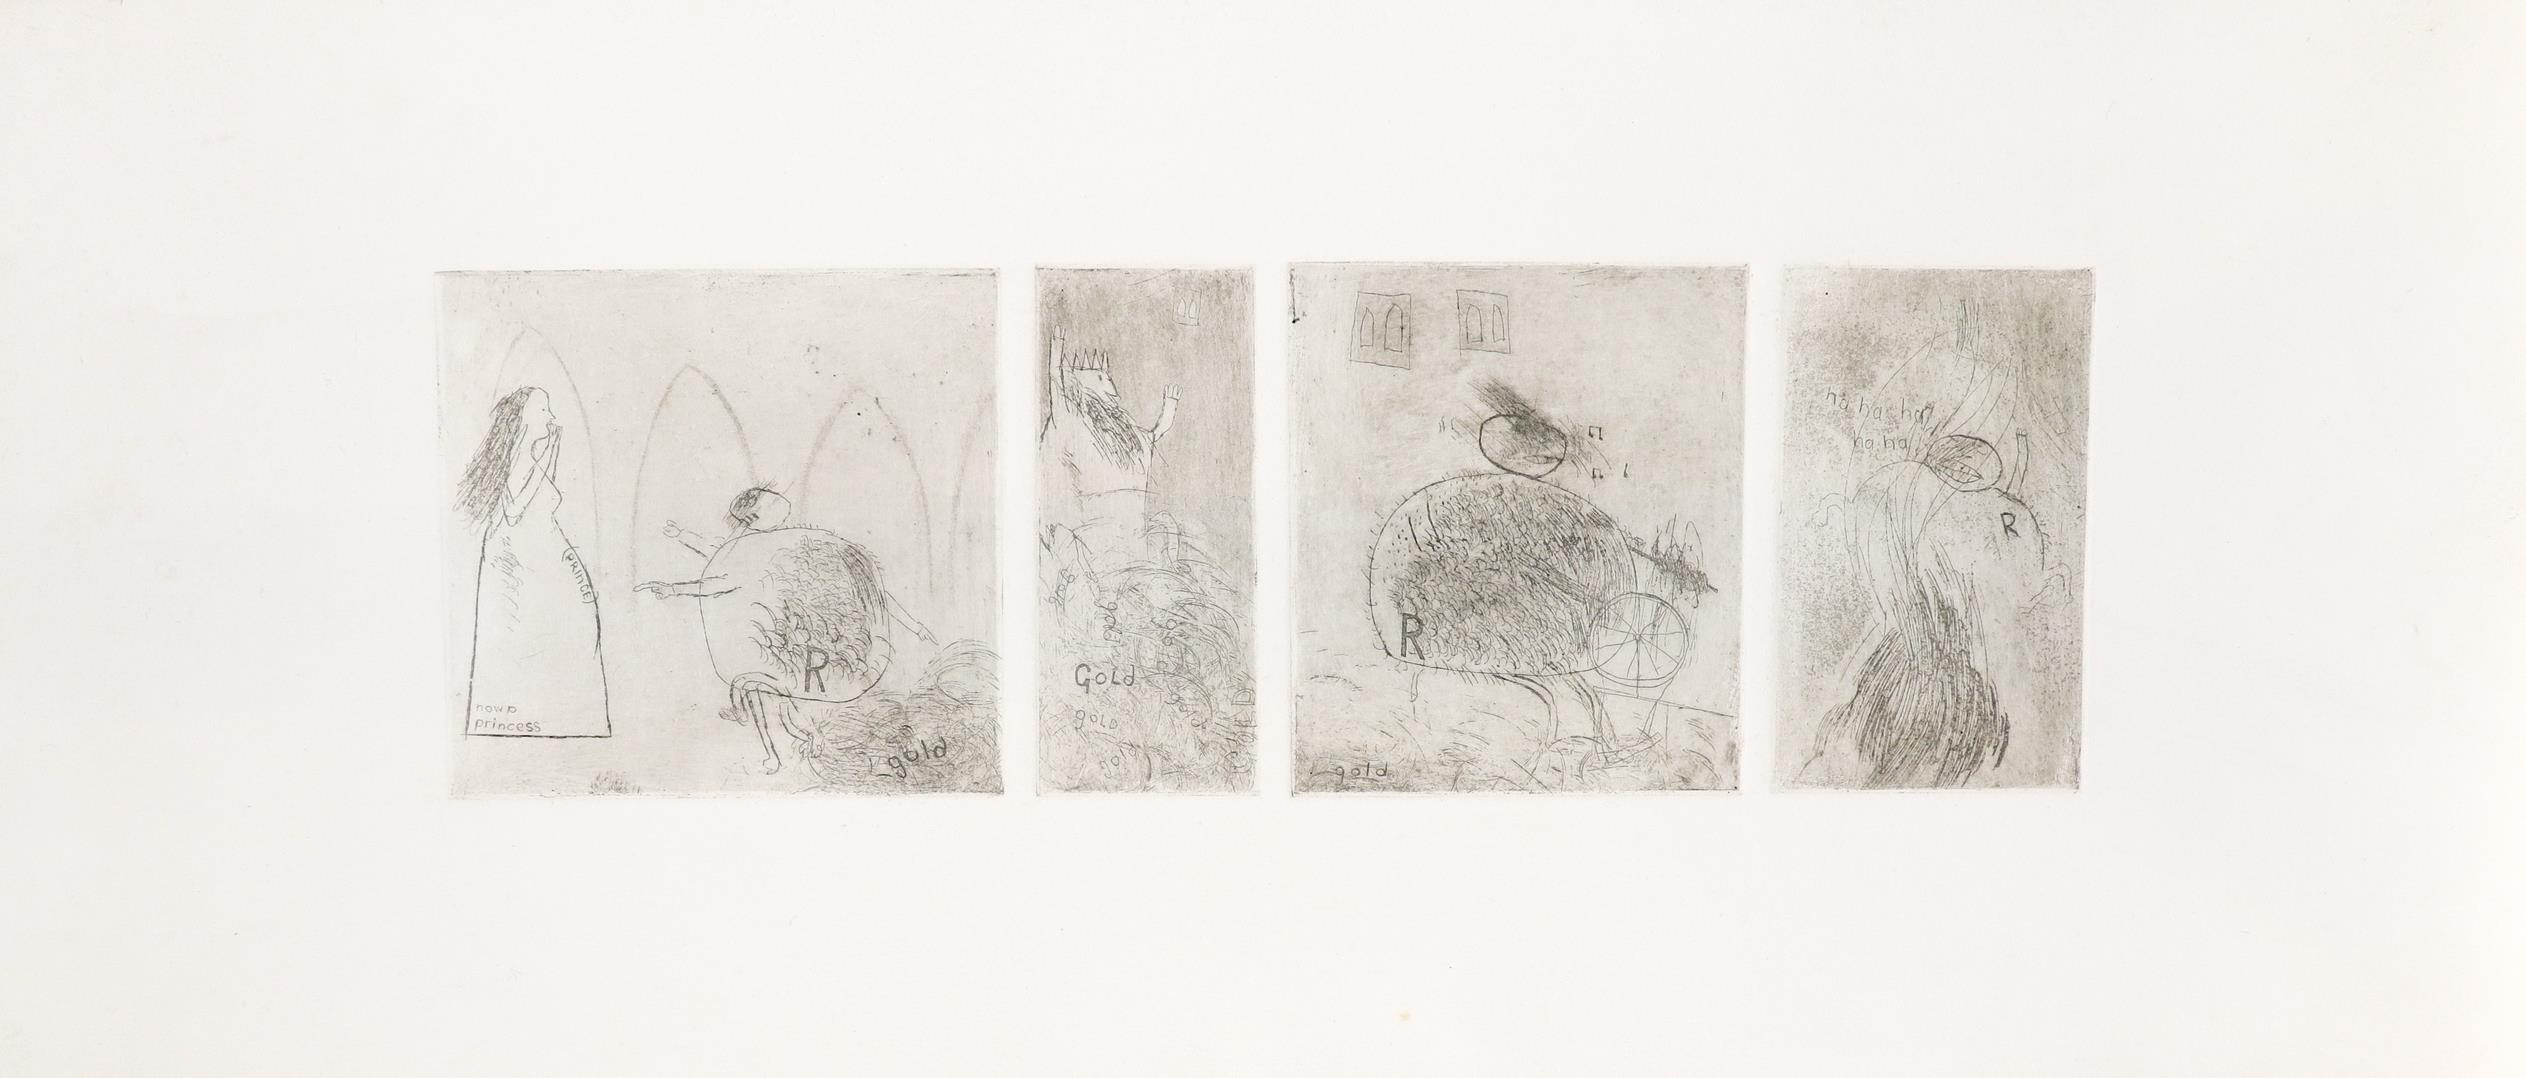 ‡David Hockney, OM, CH, RA (b.1937) Study for Rumpelstiltskin Four etchings on one sheet, trial - Image 2 of 3